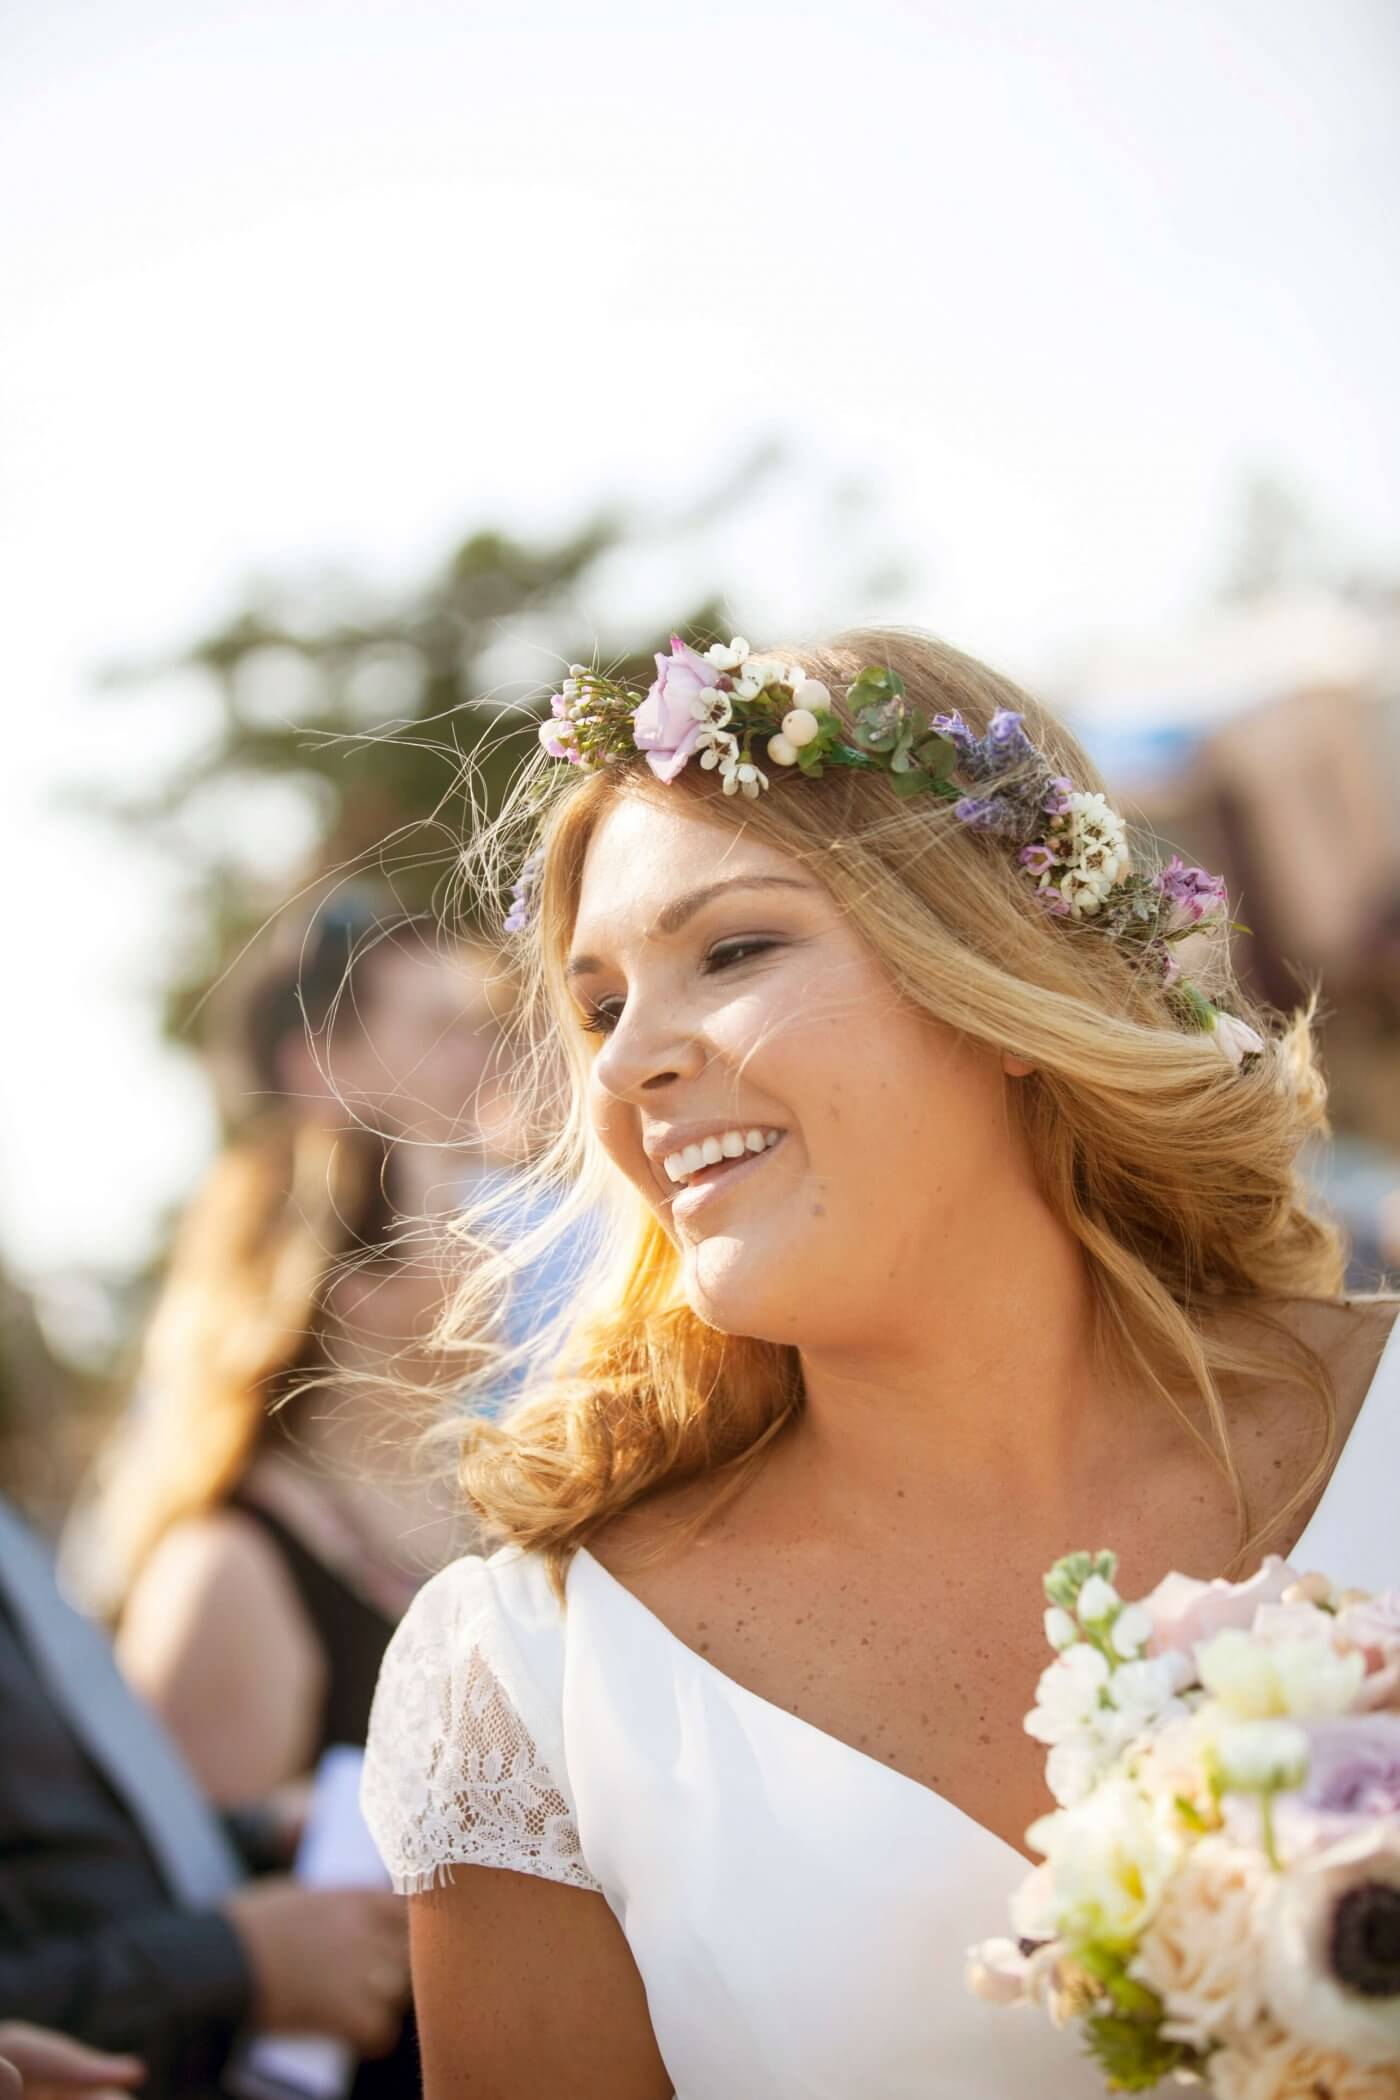 Wedding Flower   The Mustcard